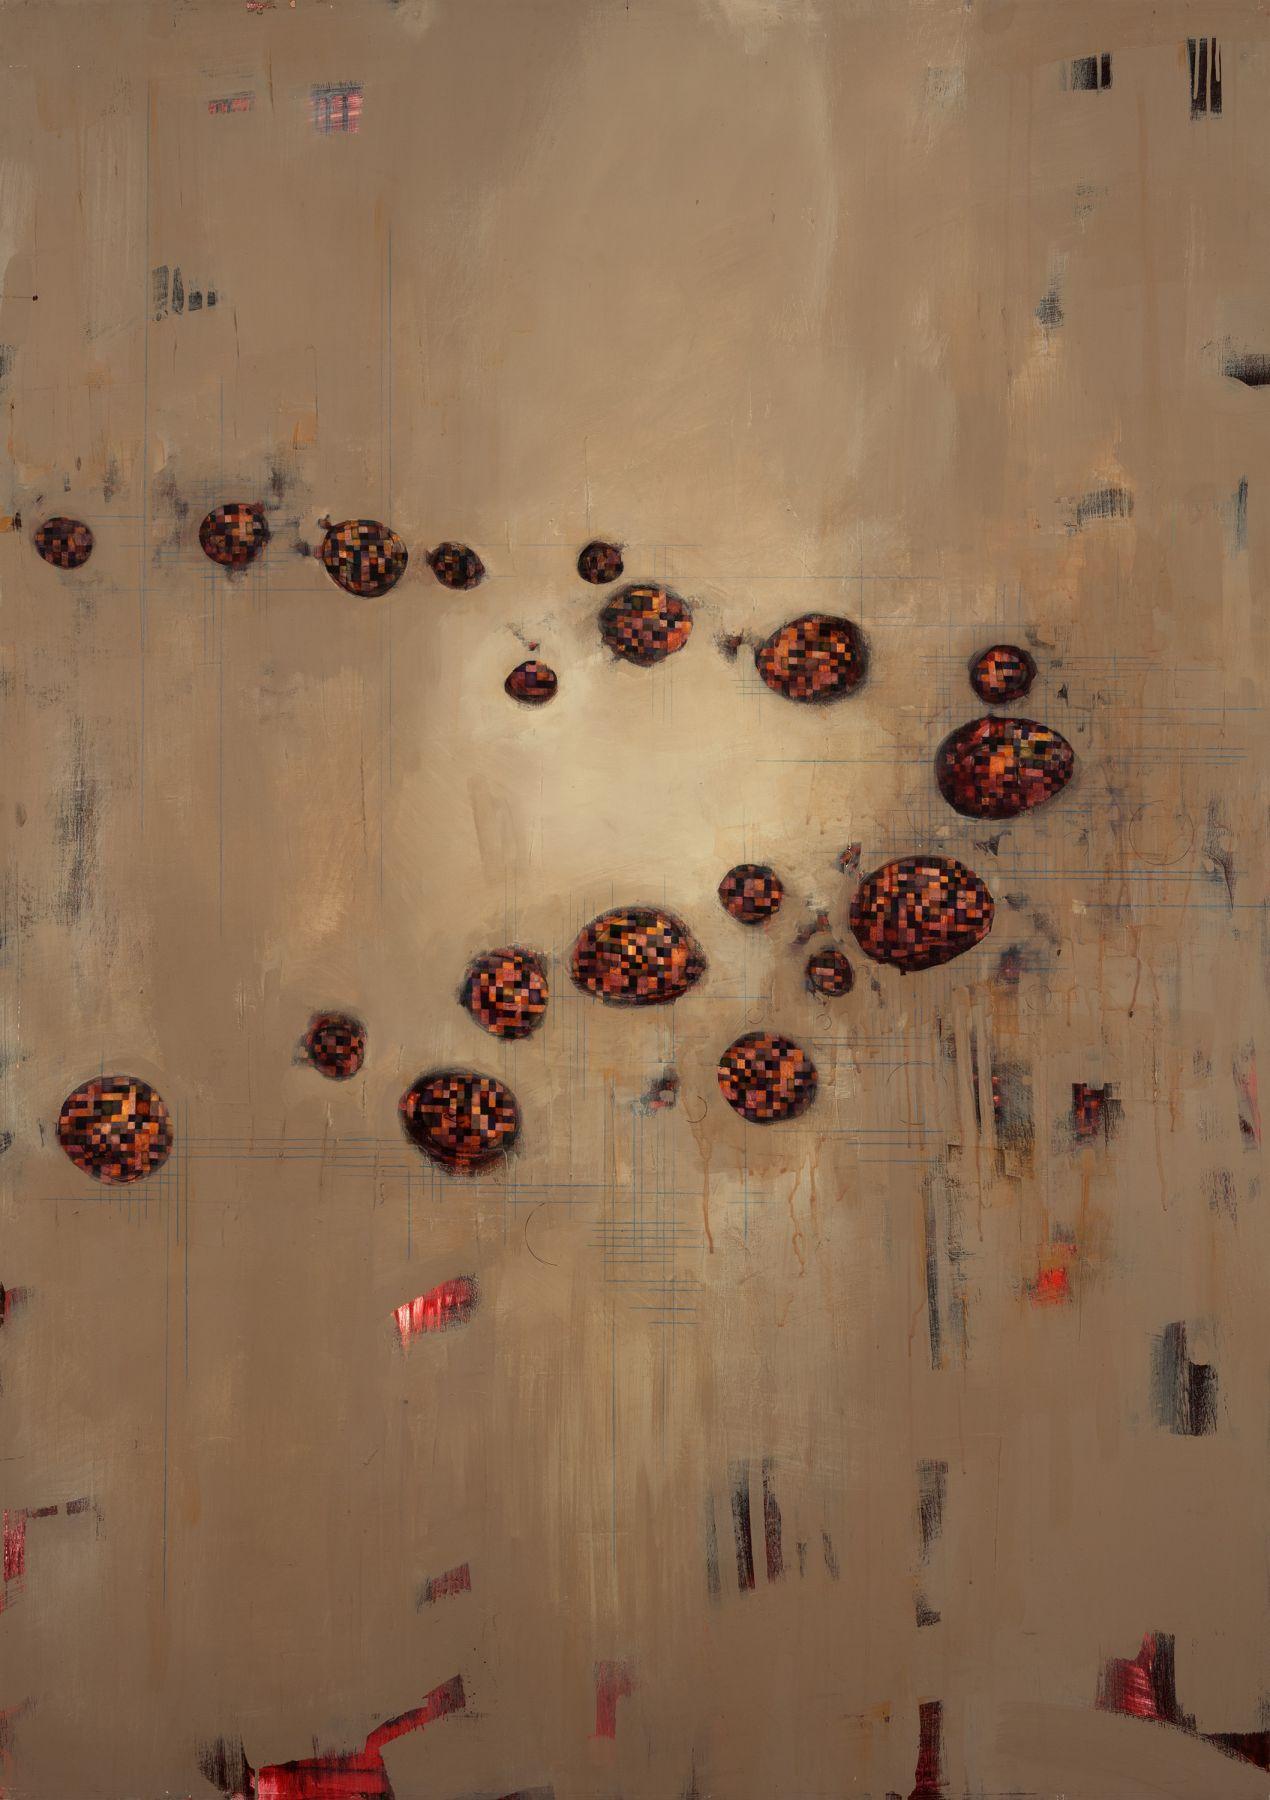 SANDY CHISM Conversion II, c. 2004